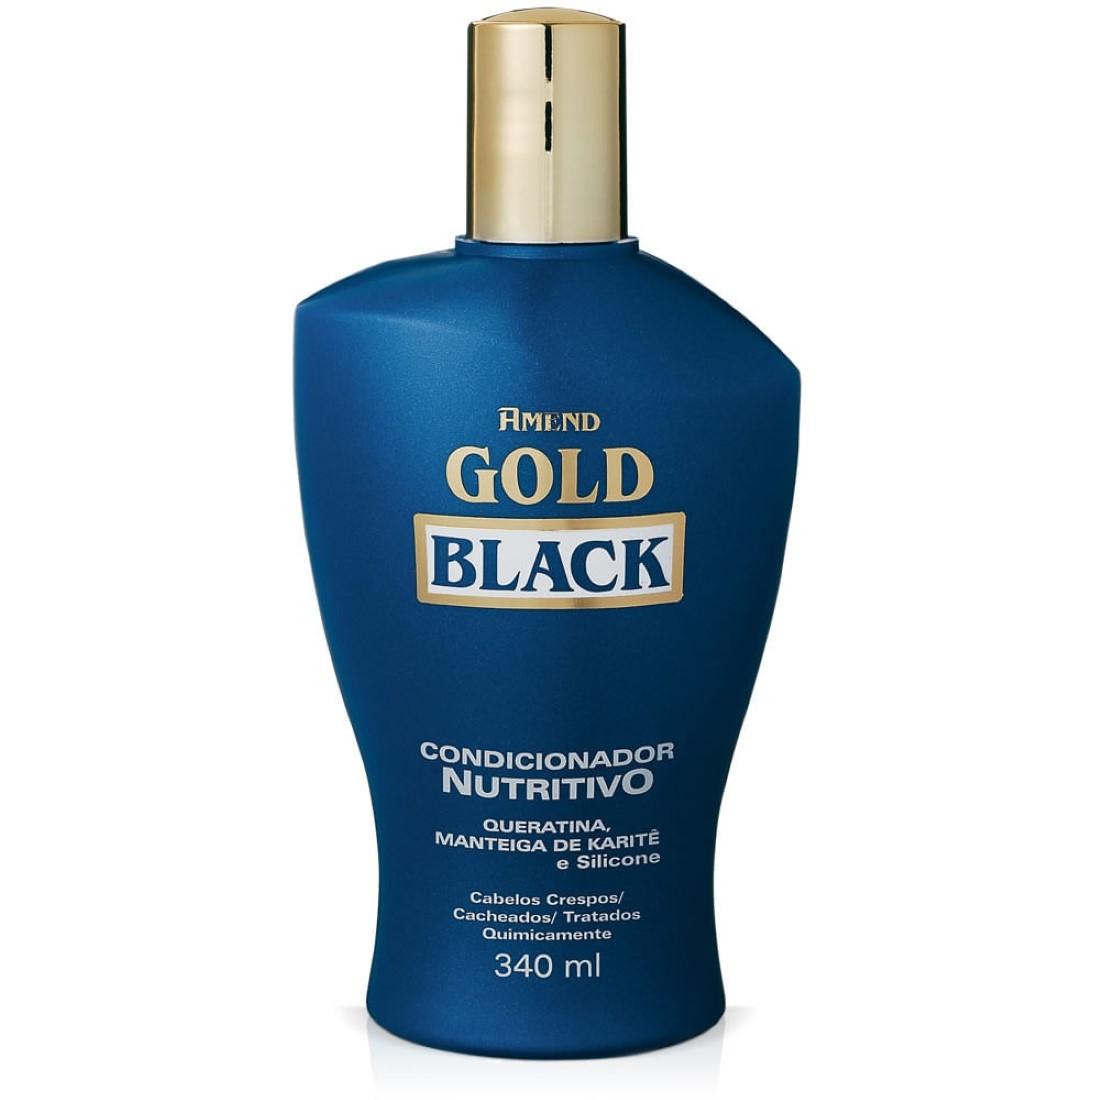 Condicionador Nutritivo Gold Black 340ml - Amend